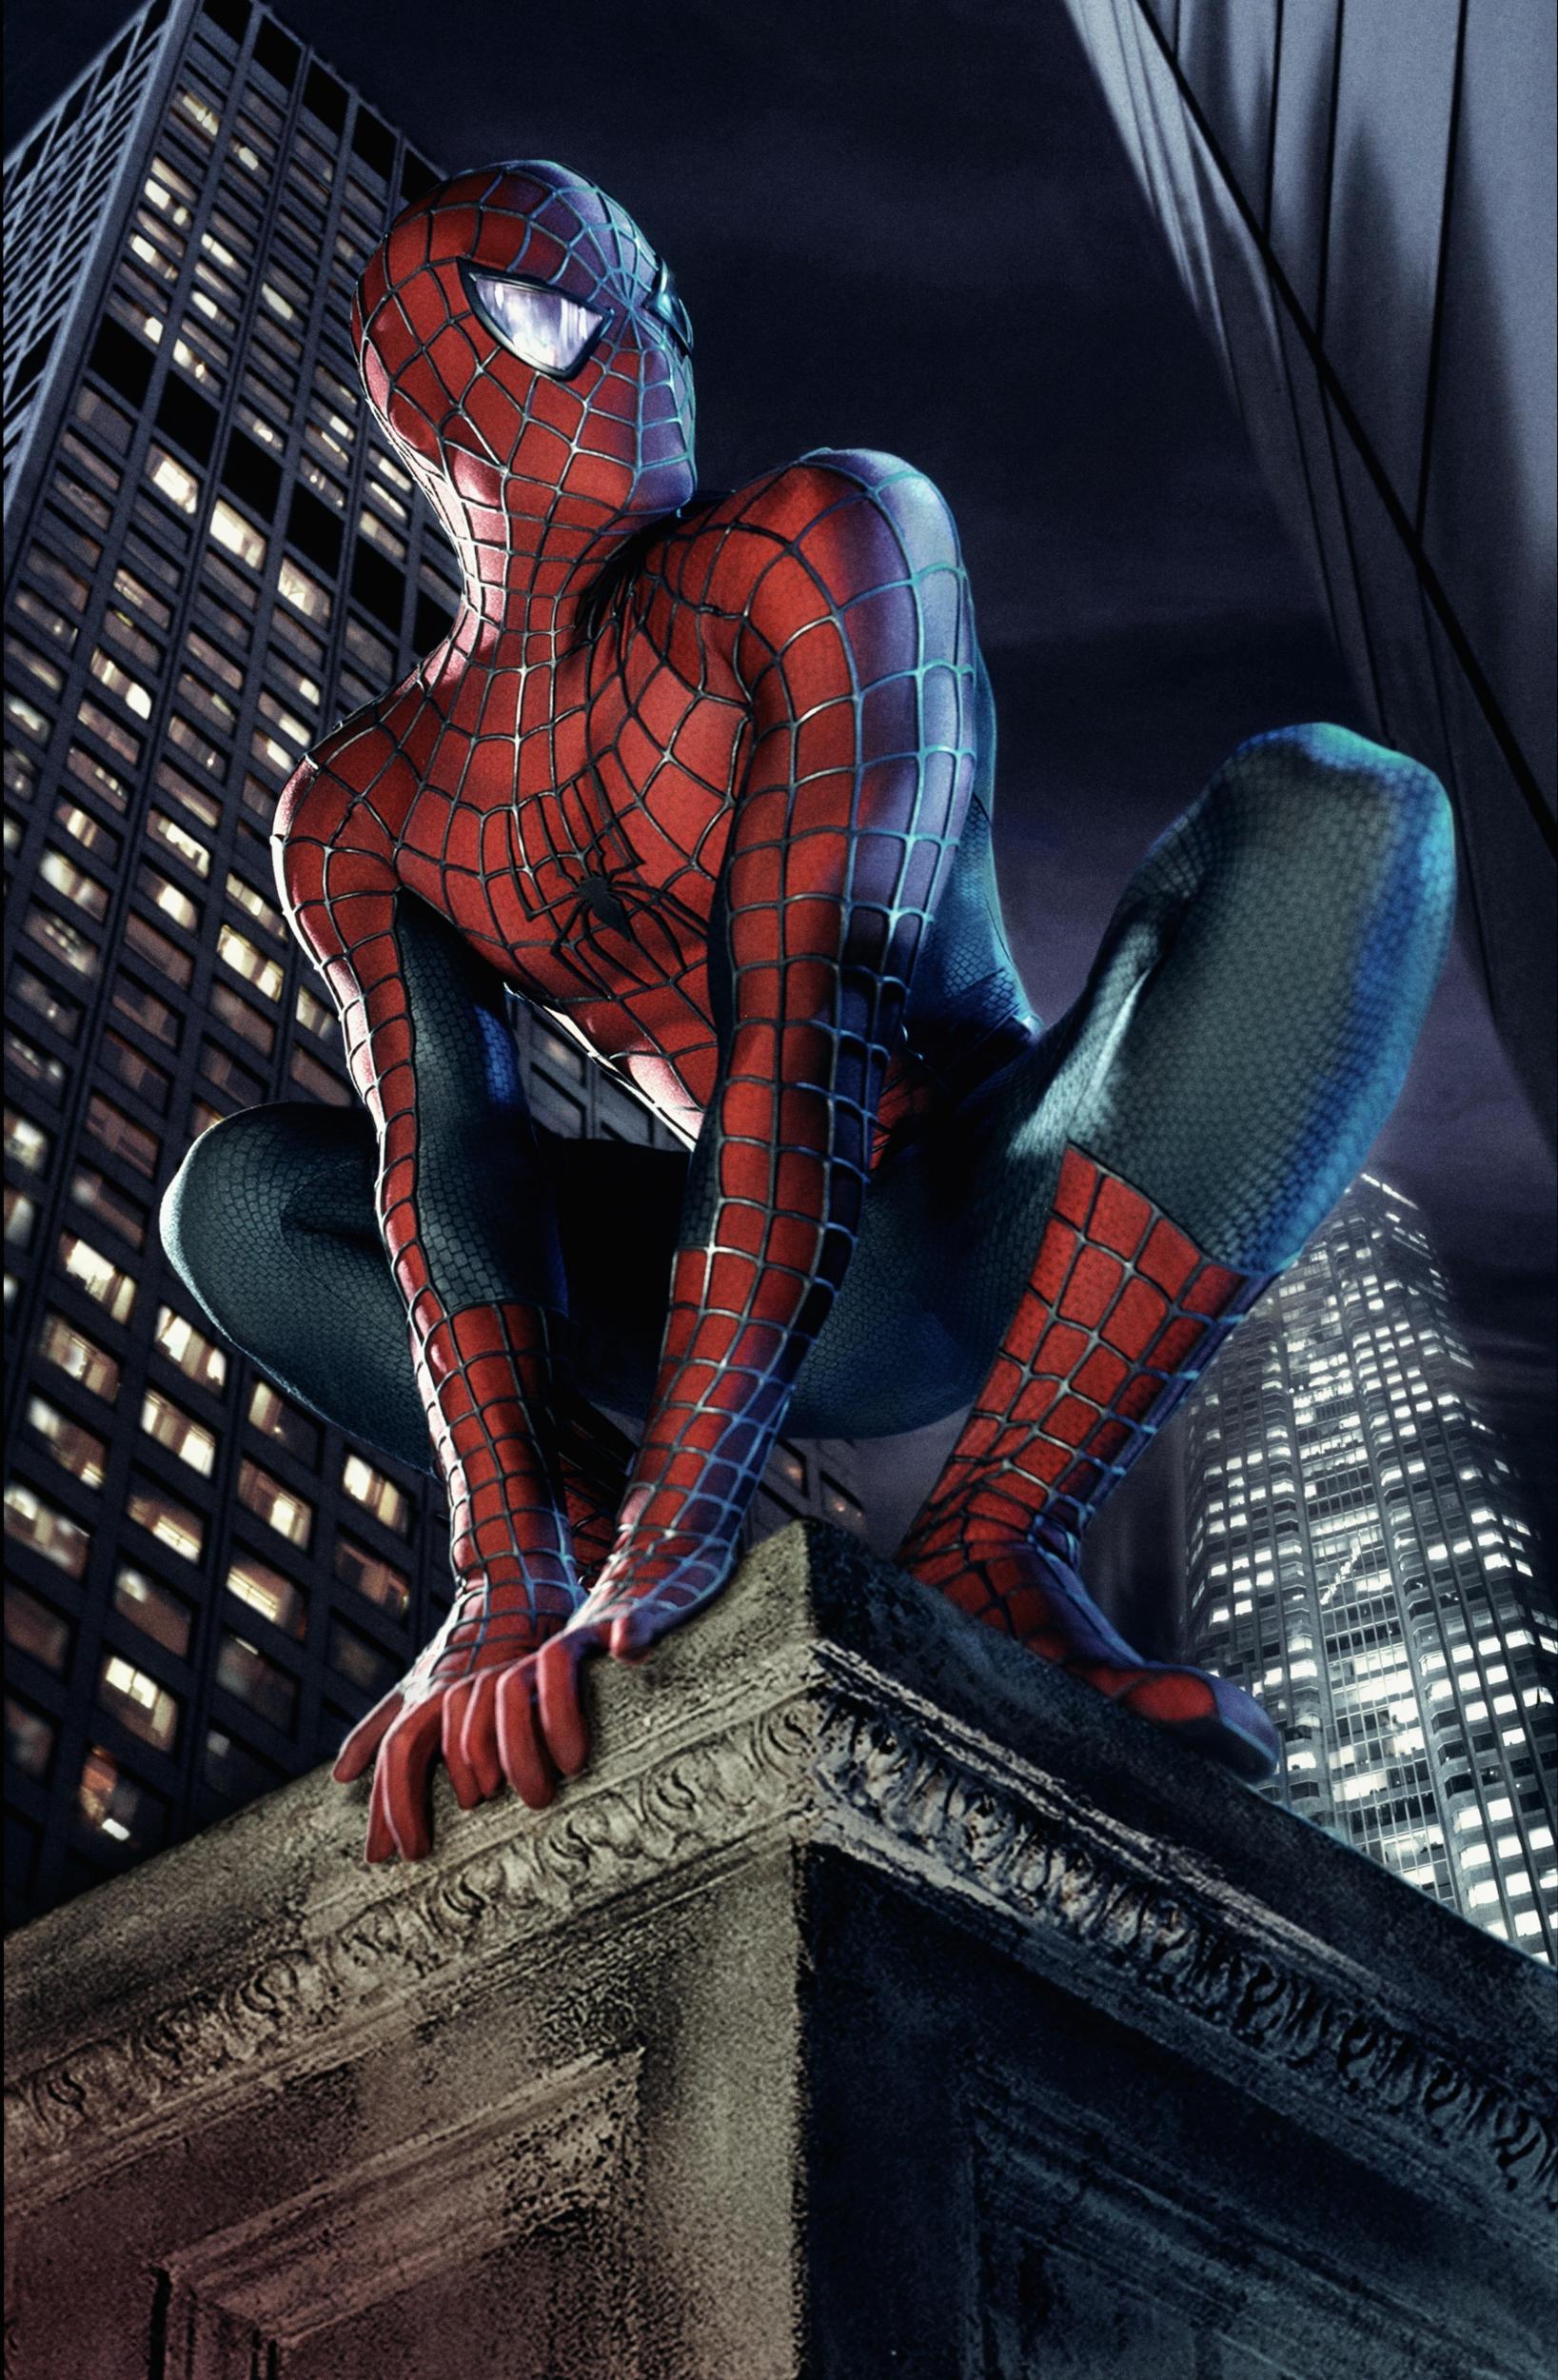 File:Spider-Man thumb.jpg